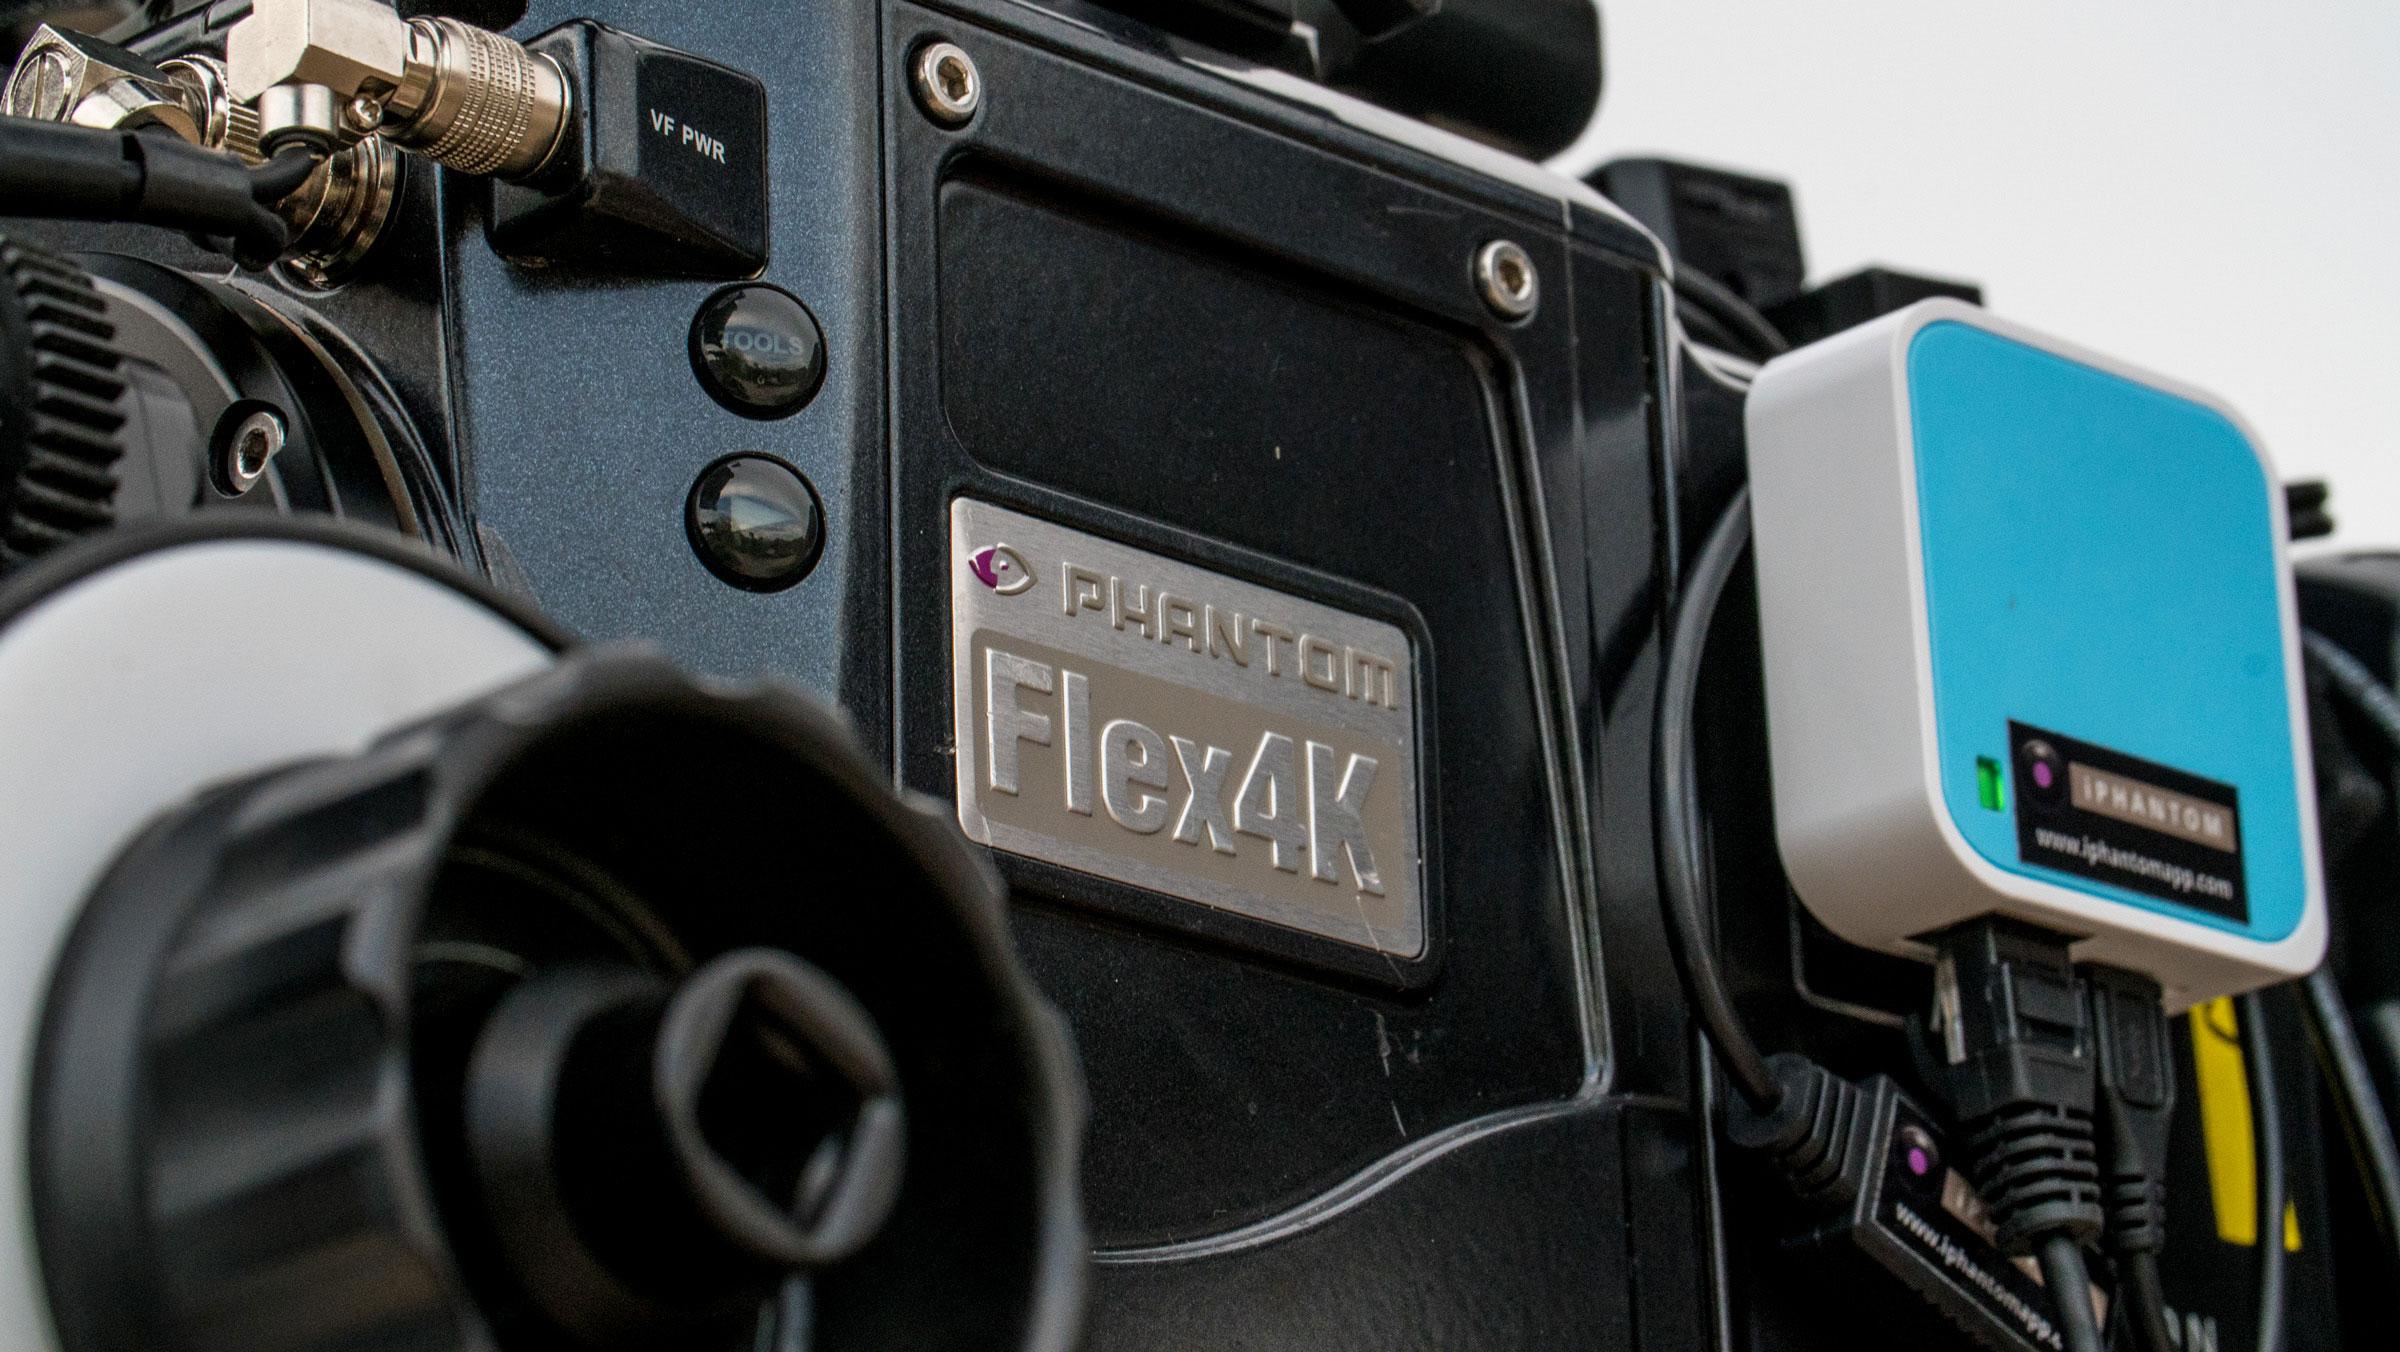 Camera Depreciation And How To Avoid Losing Money